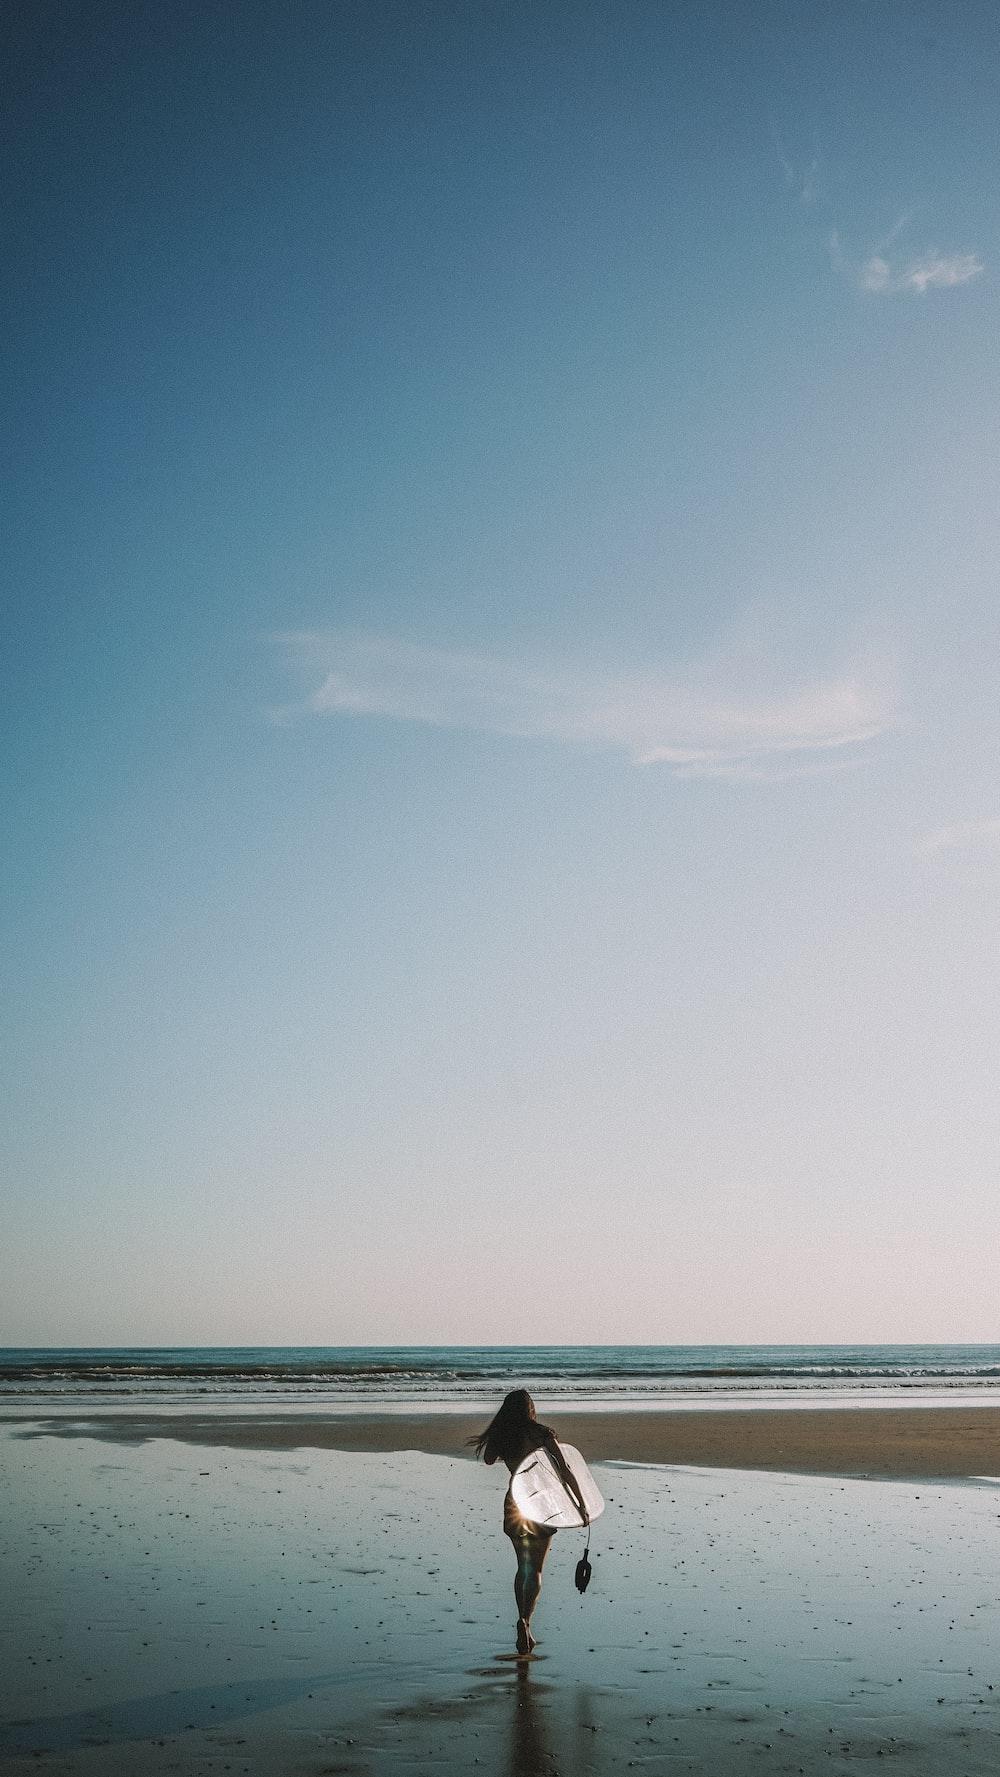 woman holding white surfboard walking on shore